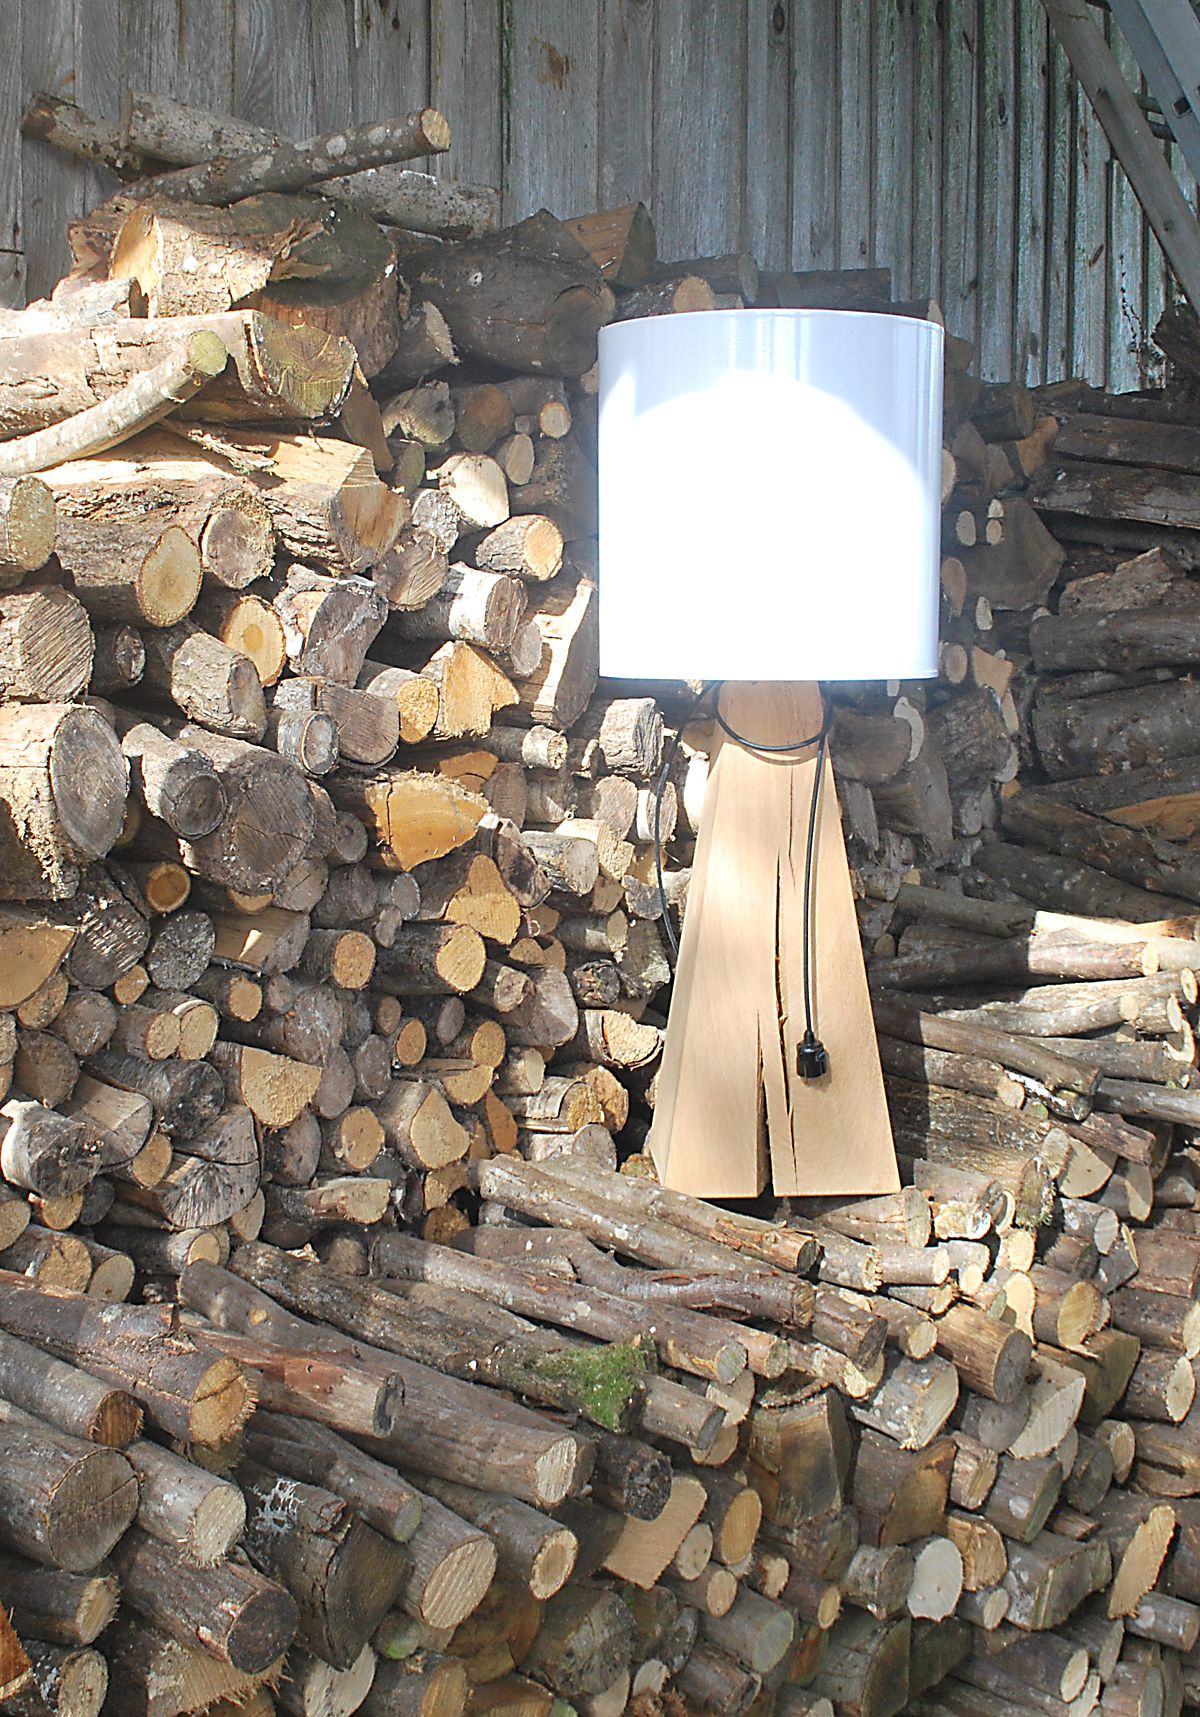 Lampe_bois massif métro 20 | Lampe bois, Bois massif